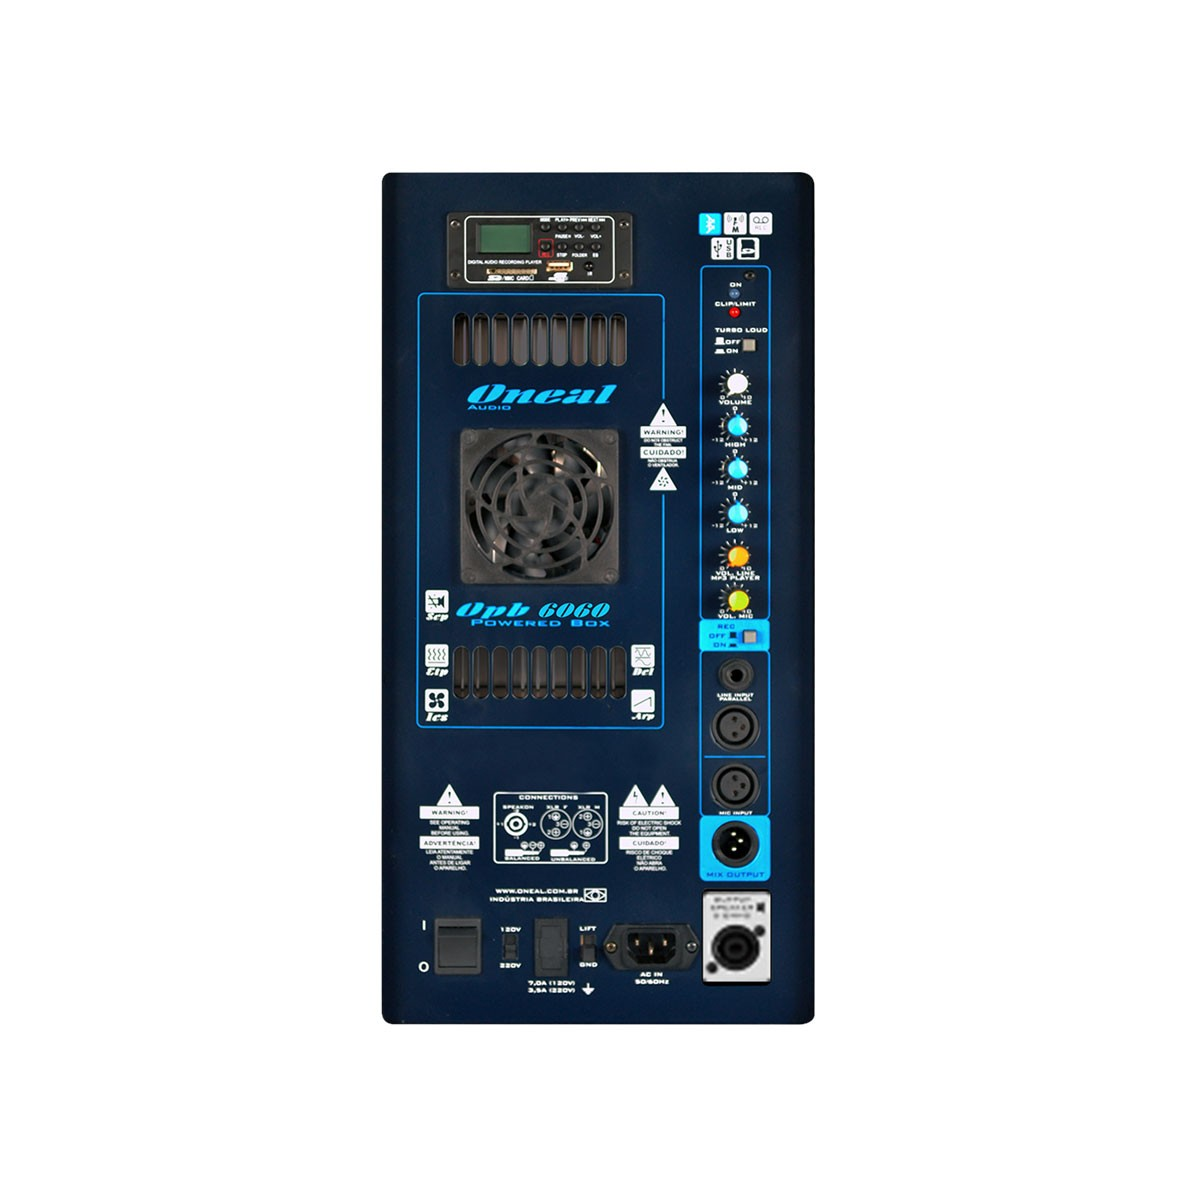 Caixa Ativa Fal 2x15 Pol 650W c/ USB / Bluetooth - OPB 6060 Oneal